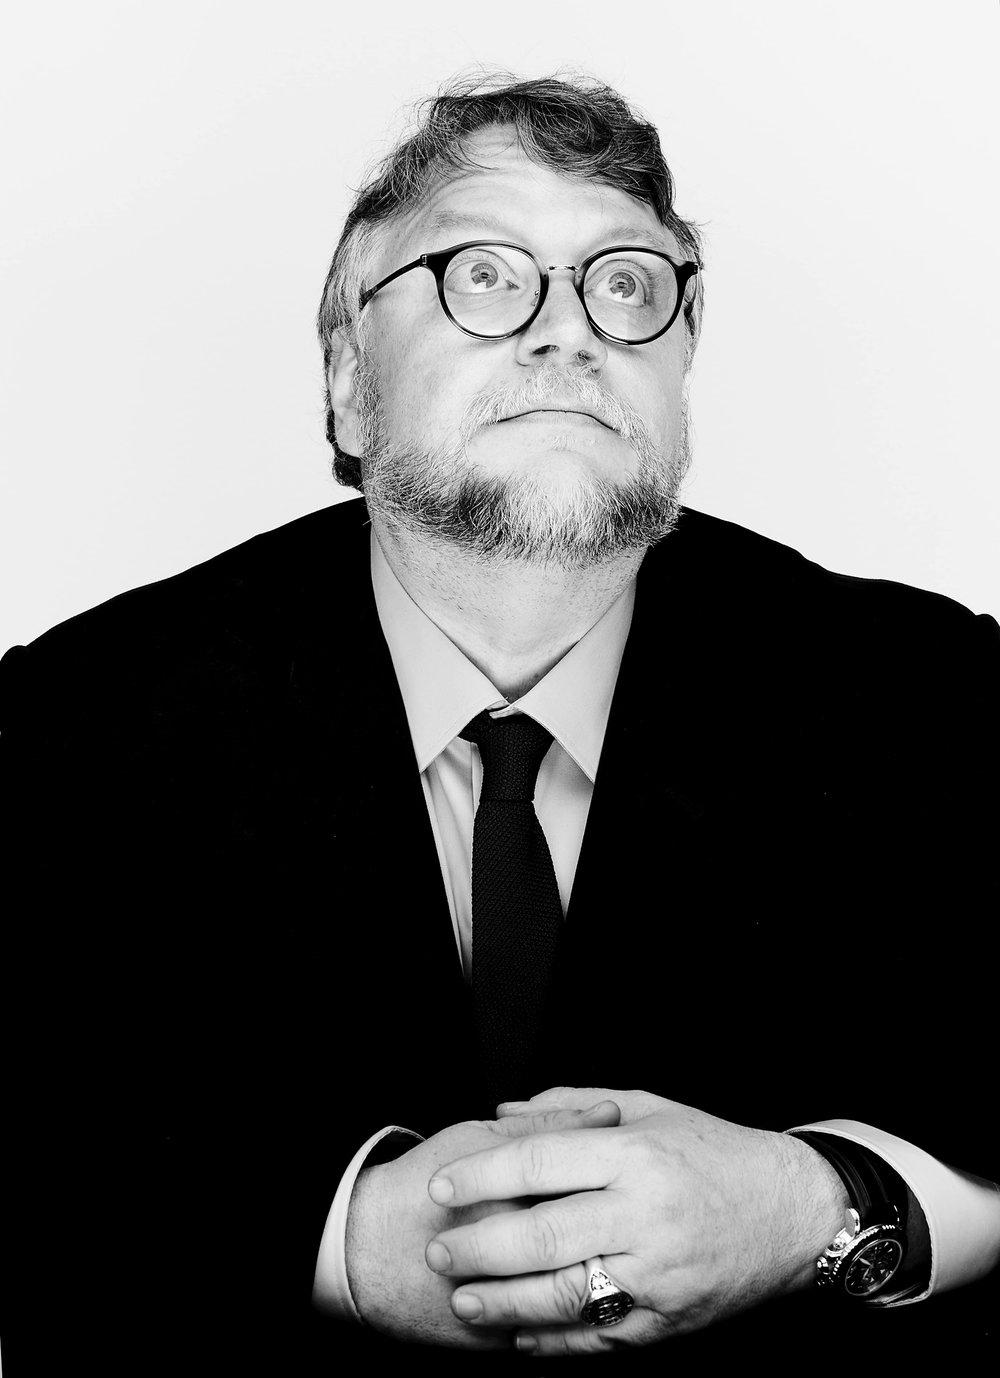 Guillermo Del Toro_0177 copy.jpg